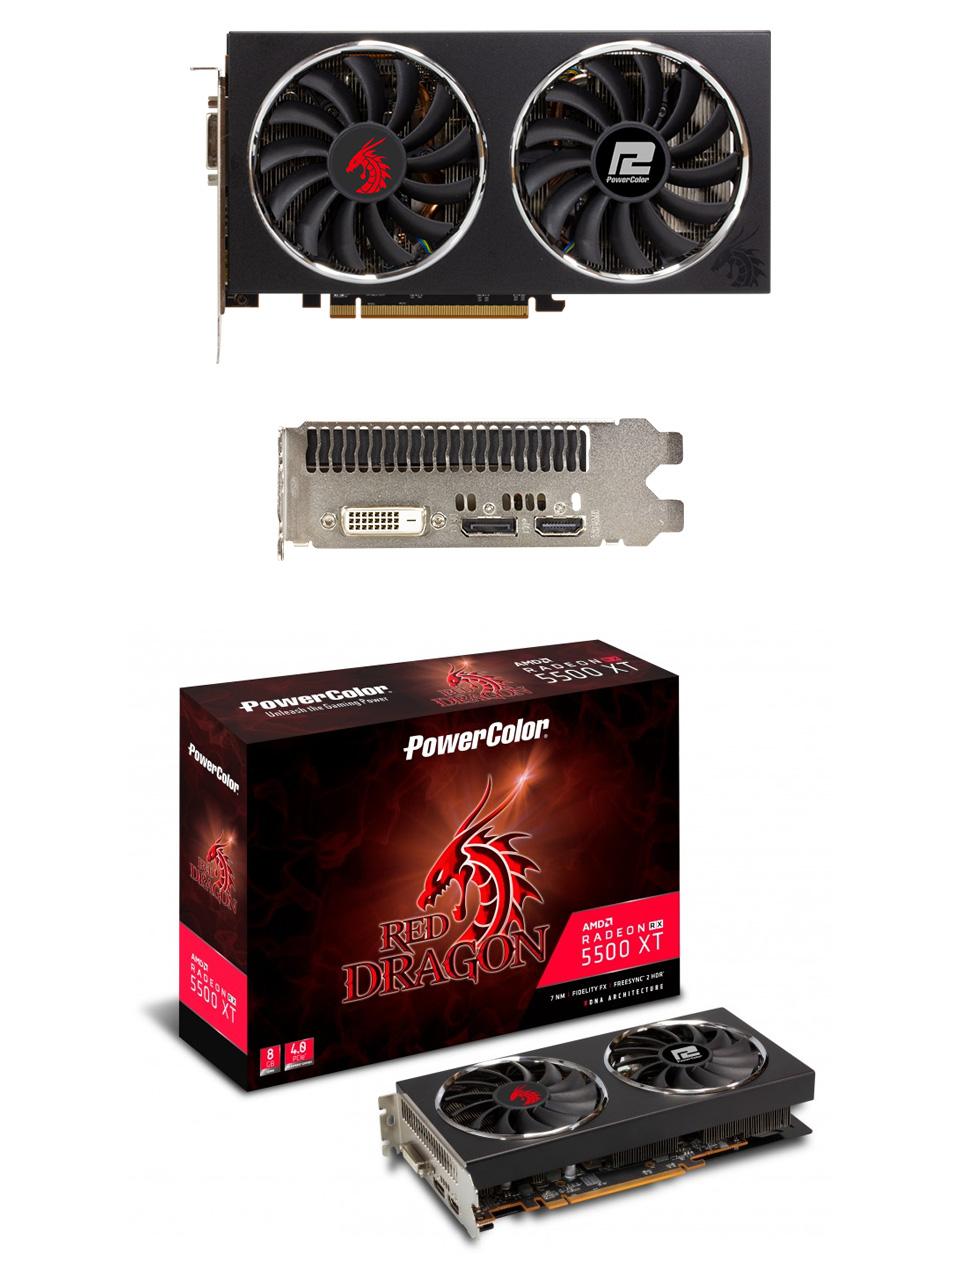 PowerColor Radeon RX 5500 XT Red Dragon 8GB product